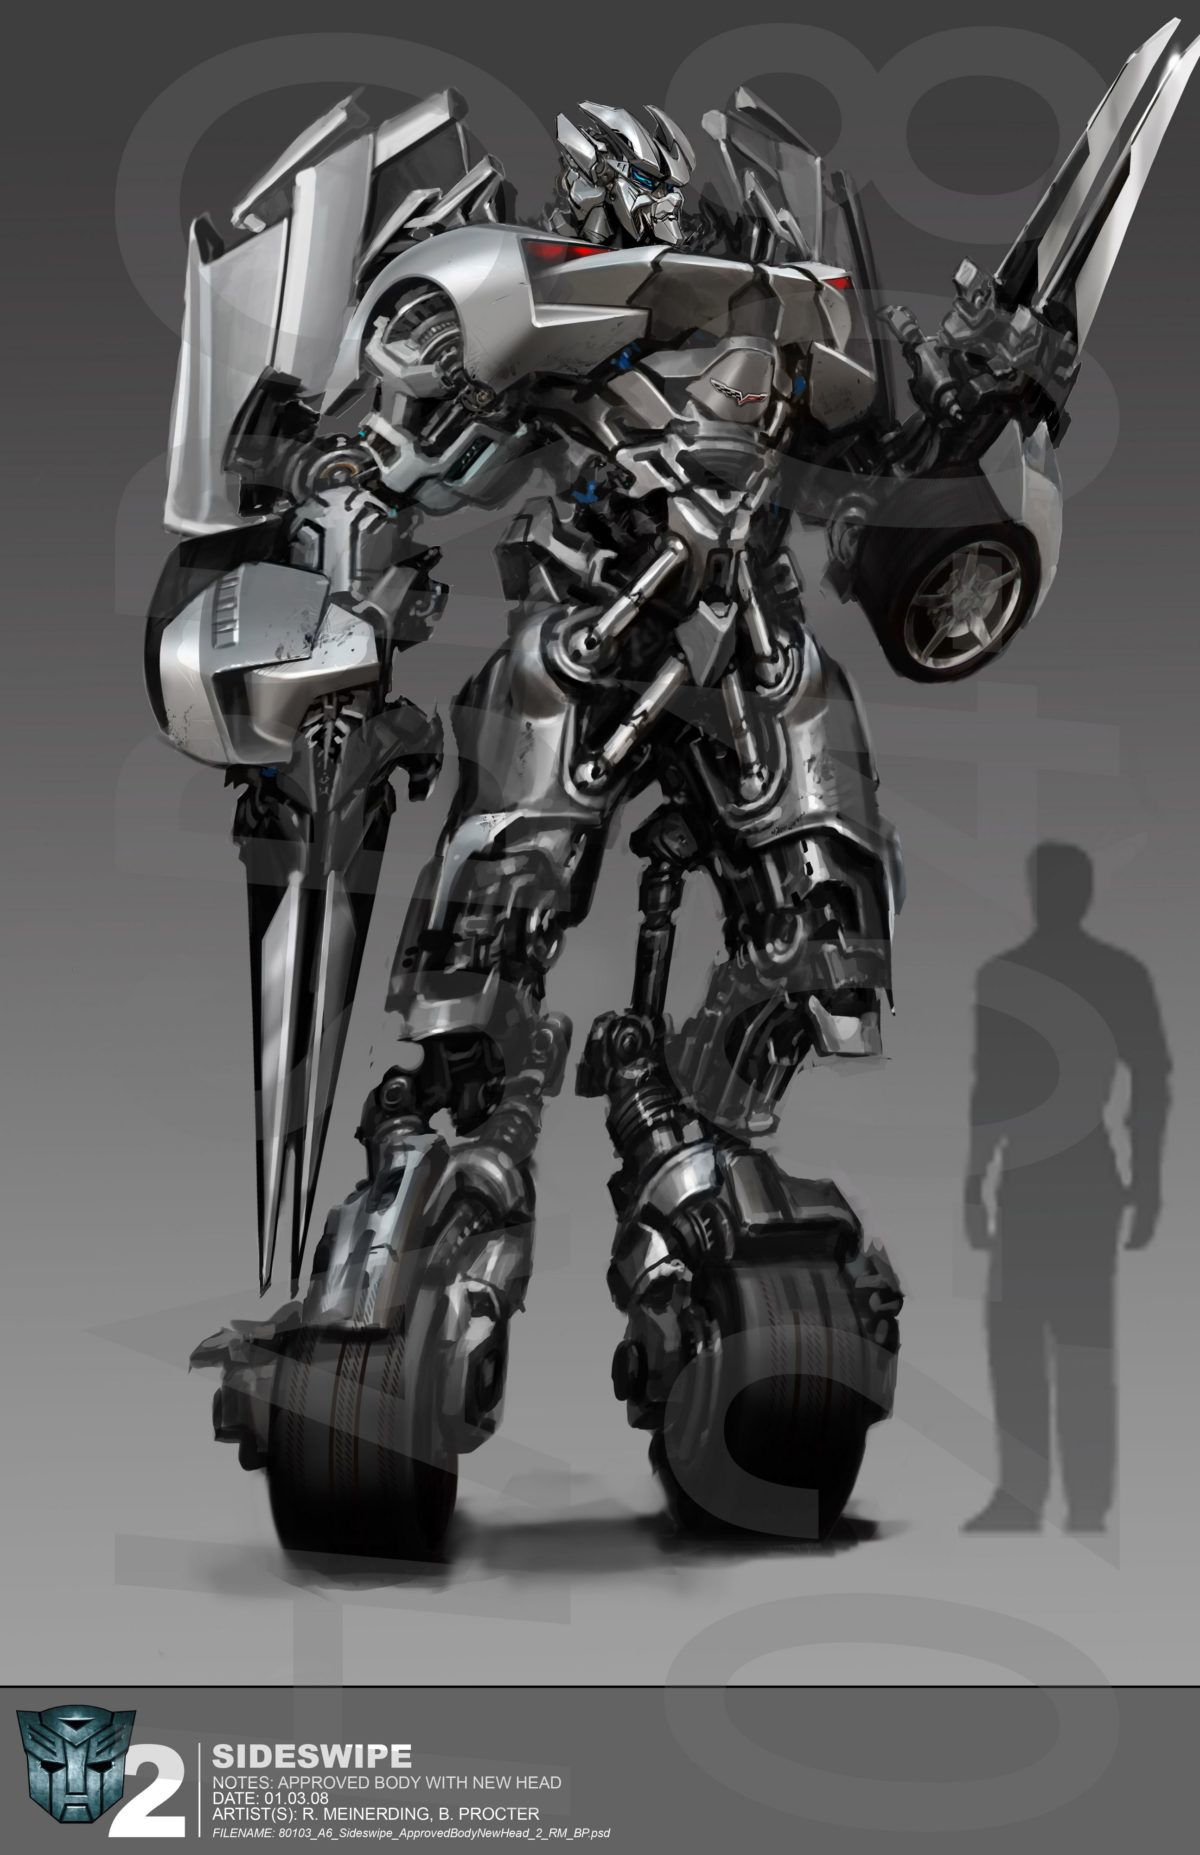 transformers concept art – Bing Images | Robot small | Pinterest …